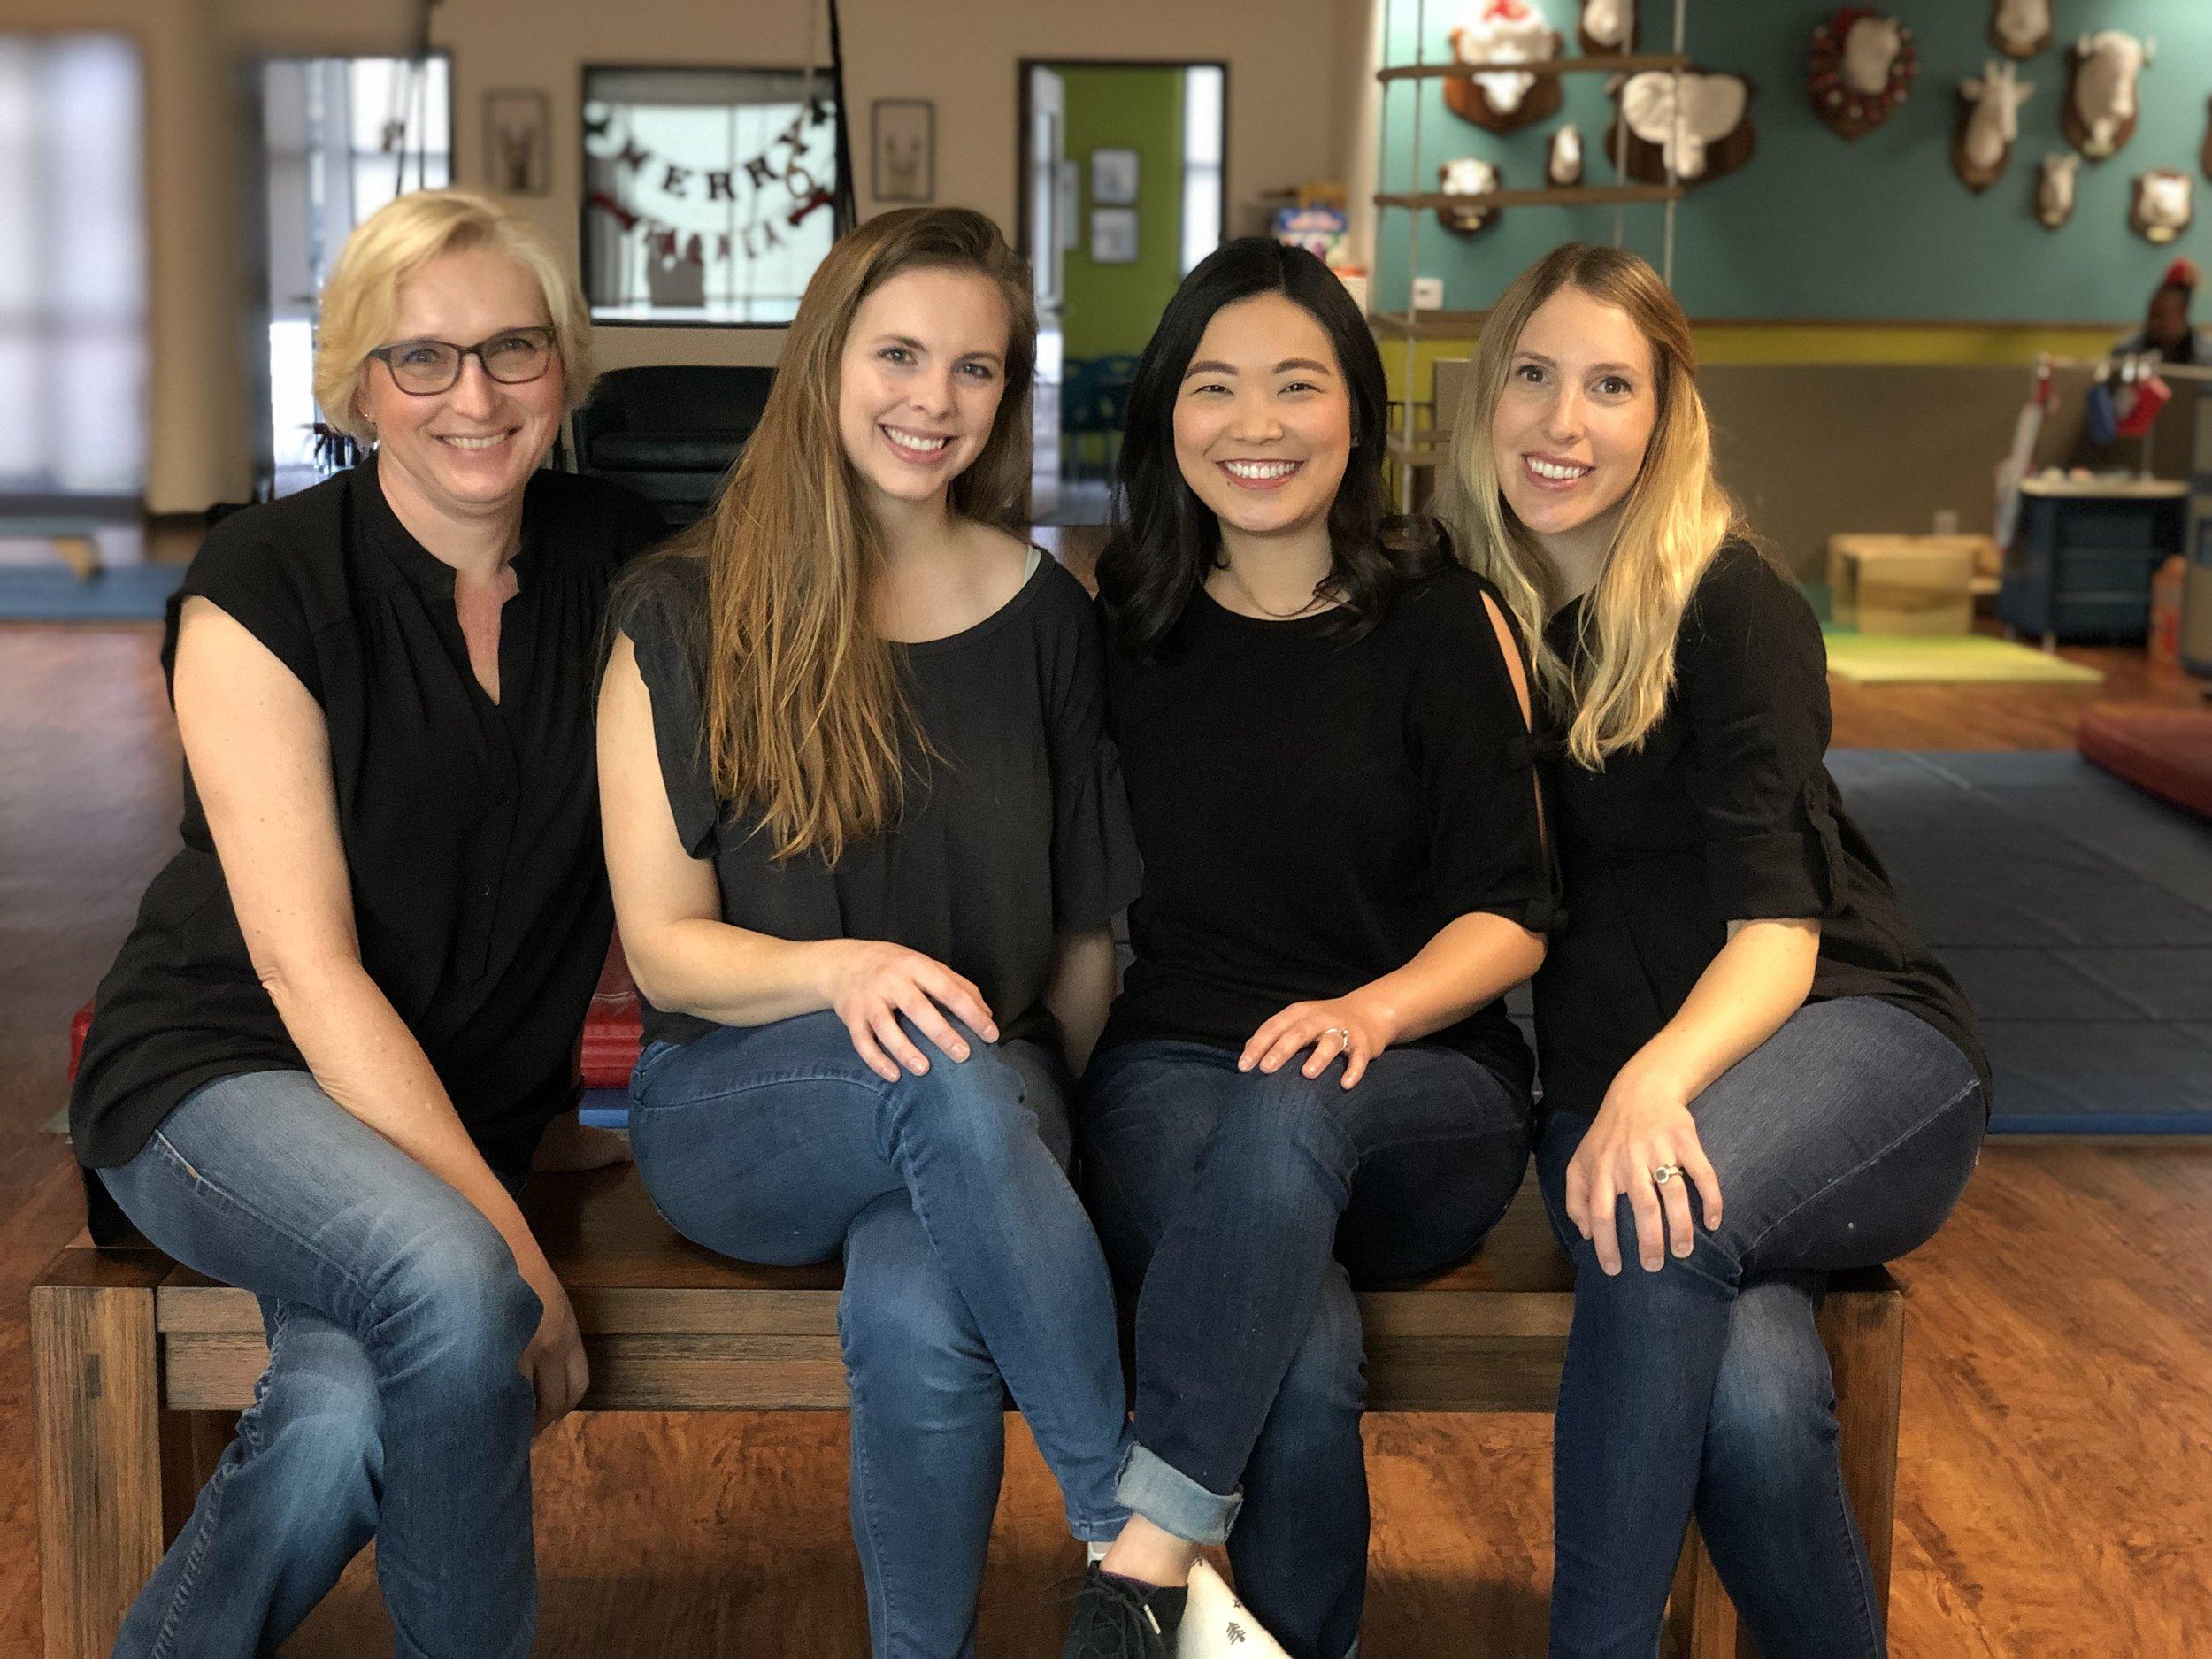 WonderLab Occupational Therapy team